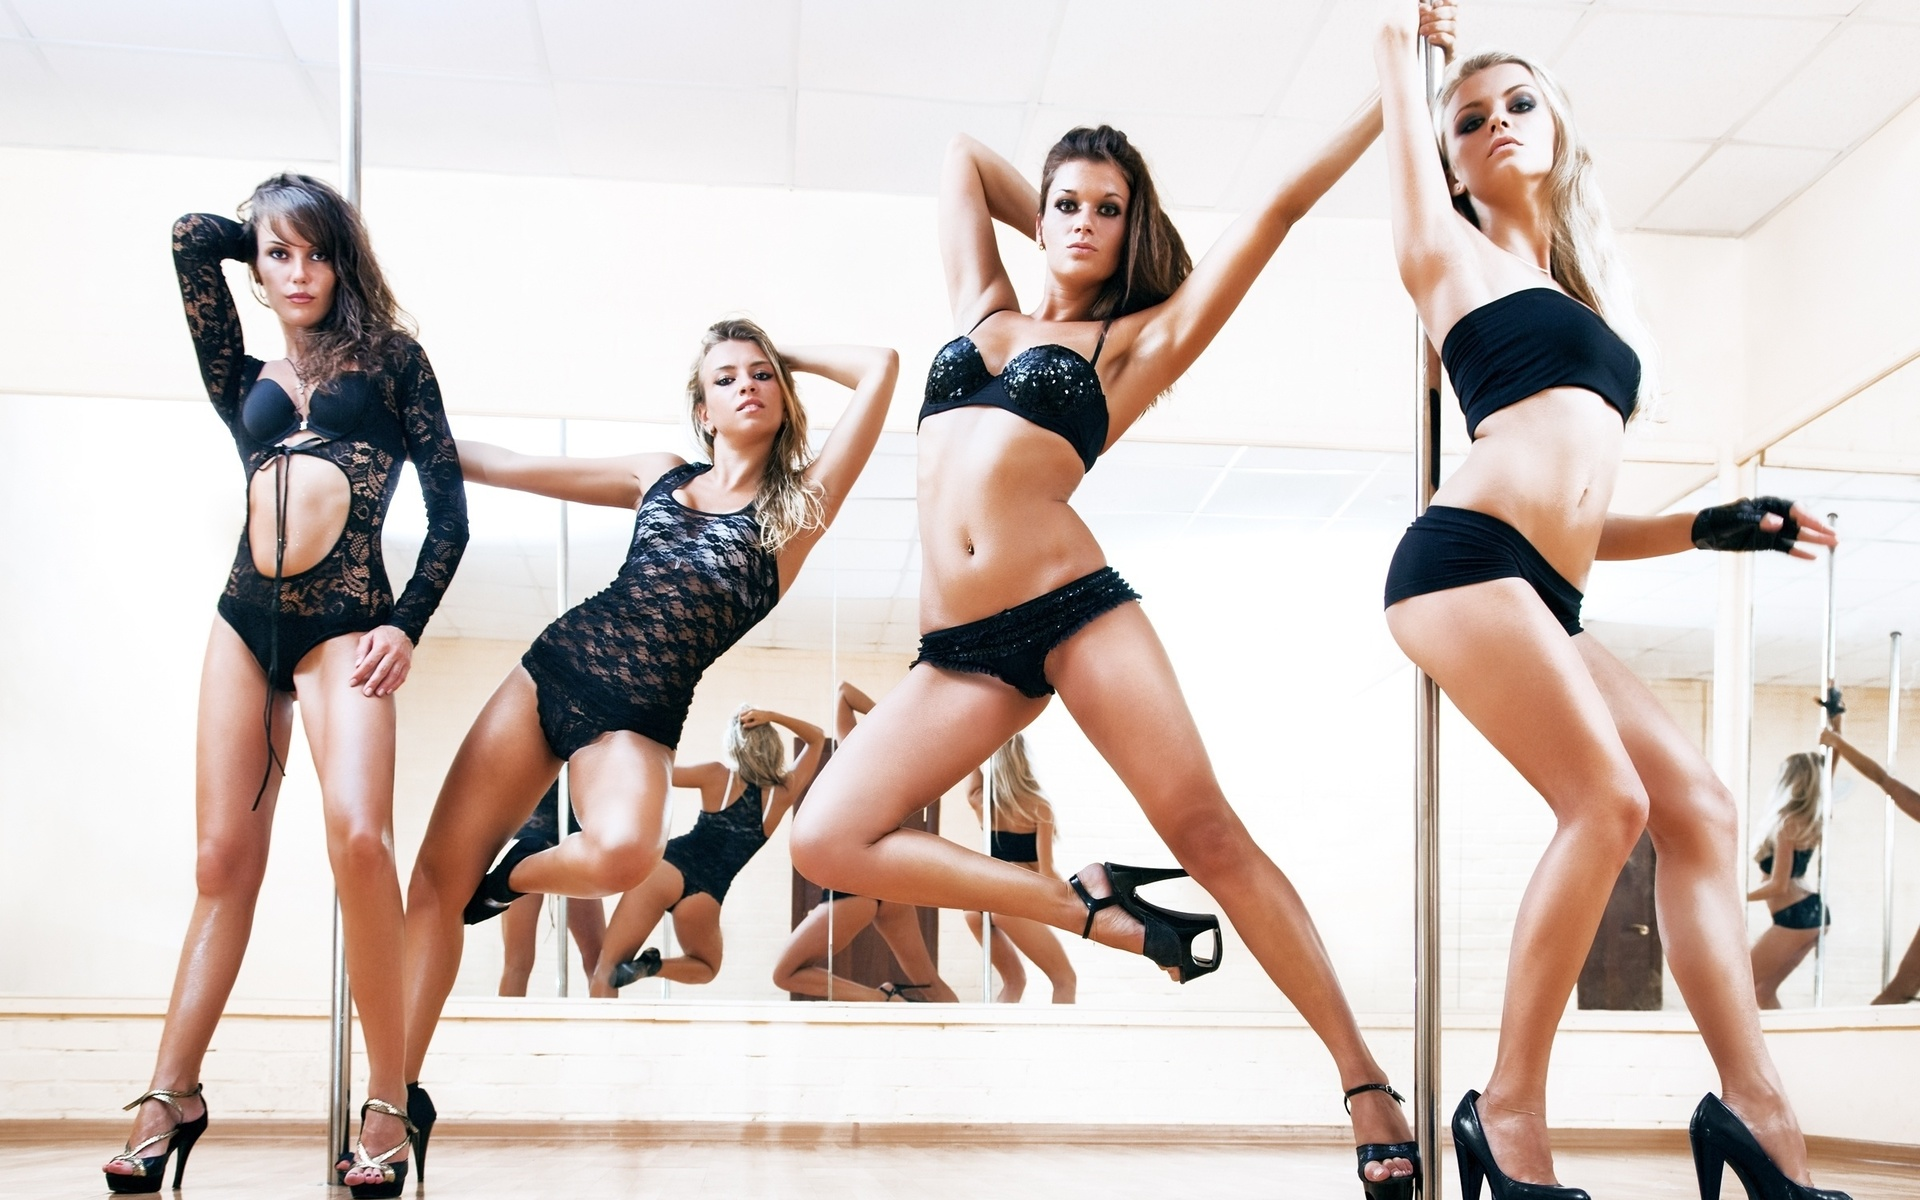 Фото стриптизёрш танцующих 25 фотография